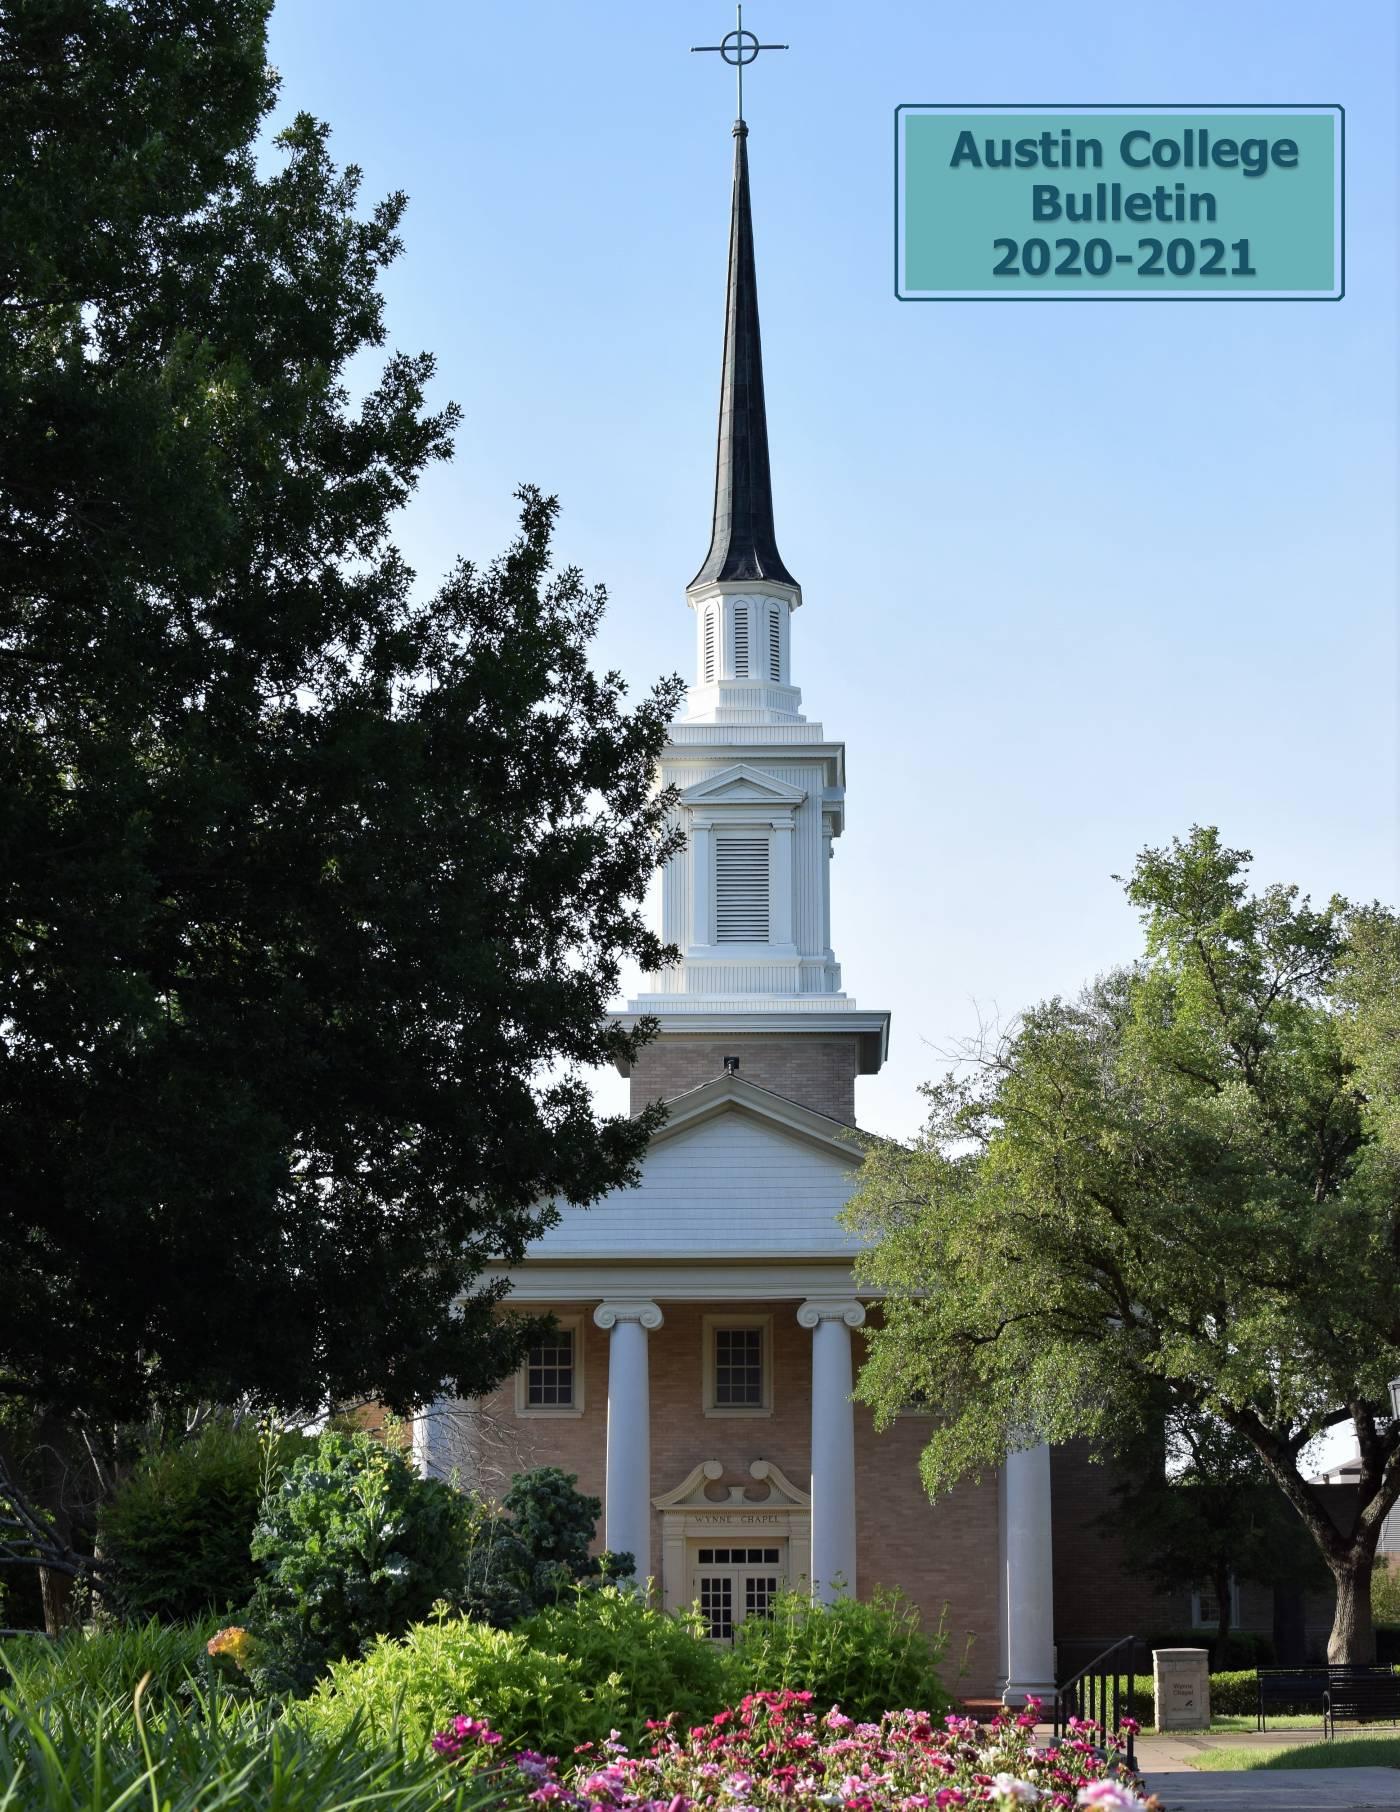 Austin College Bulletin 2020-2021